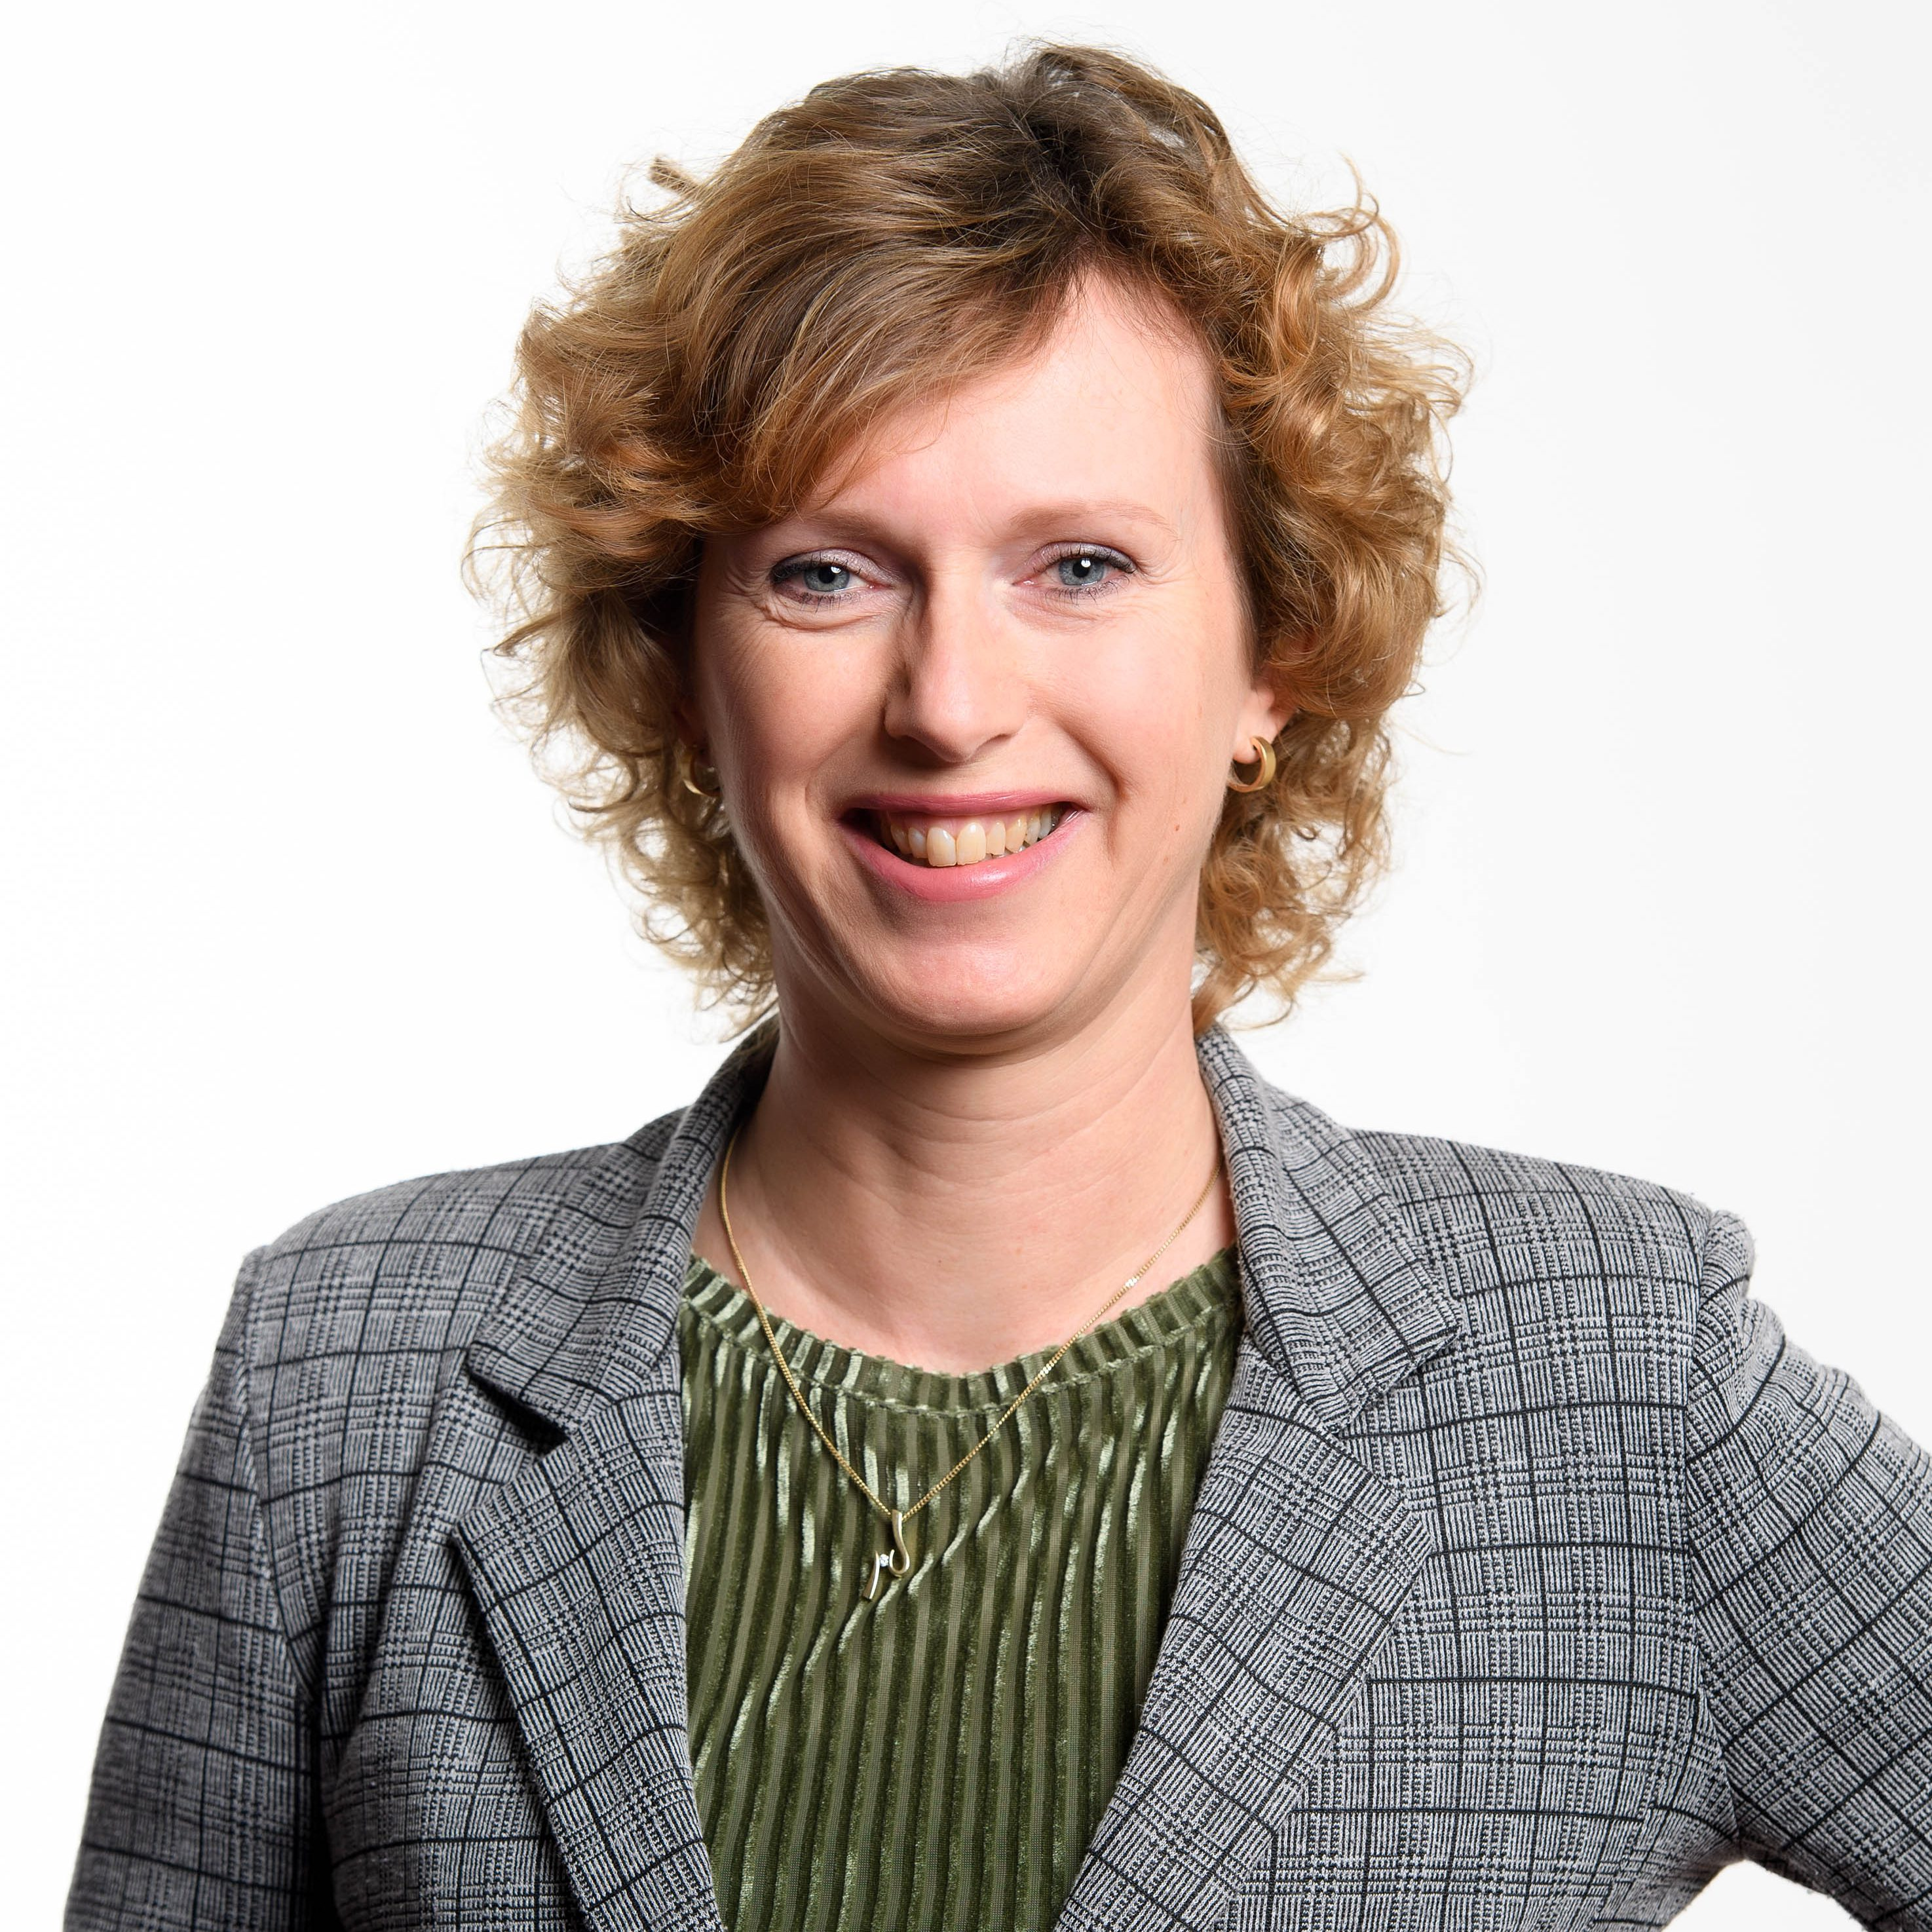 Marleen Pouwels